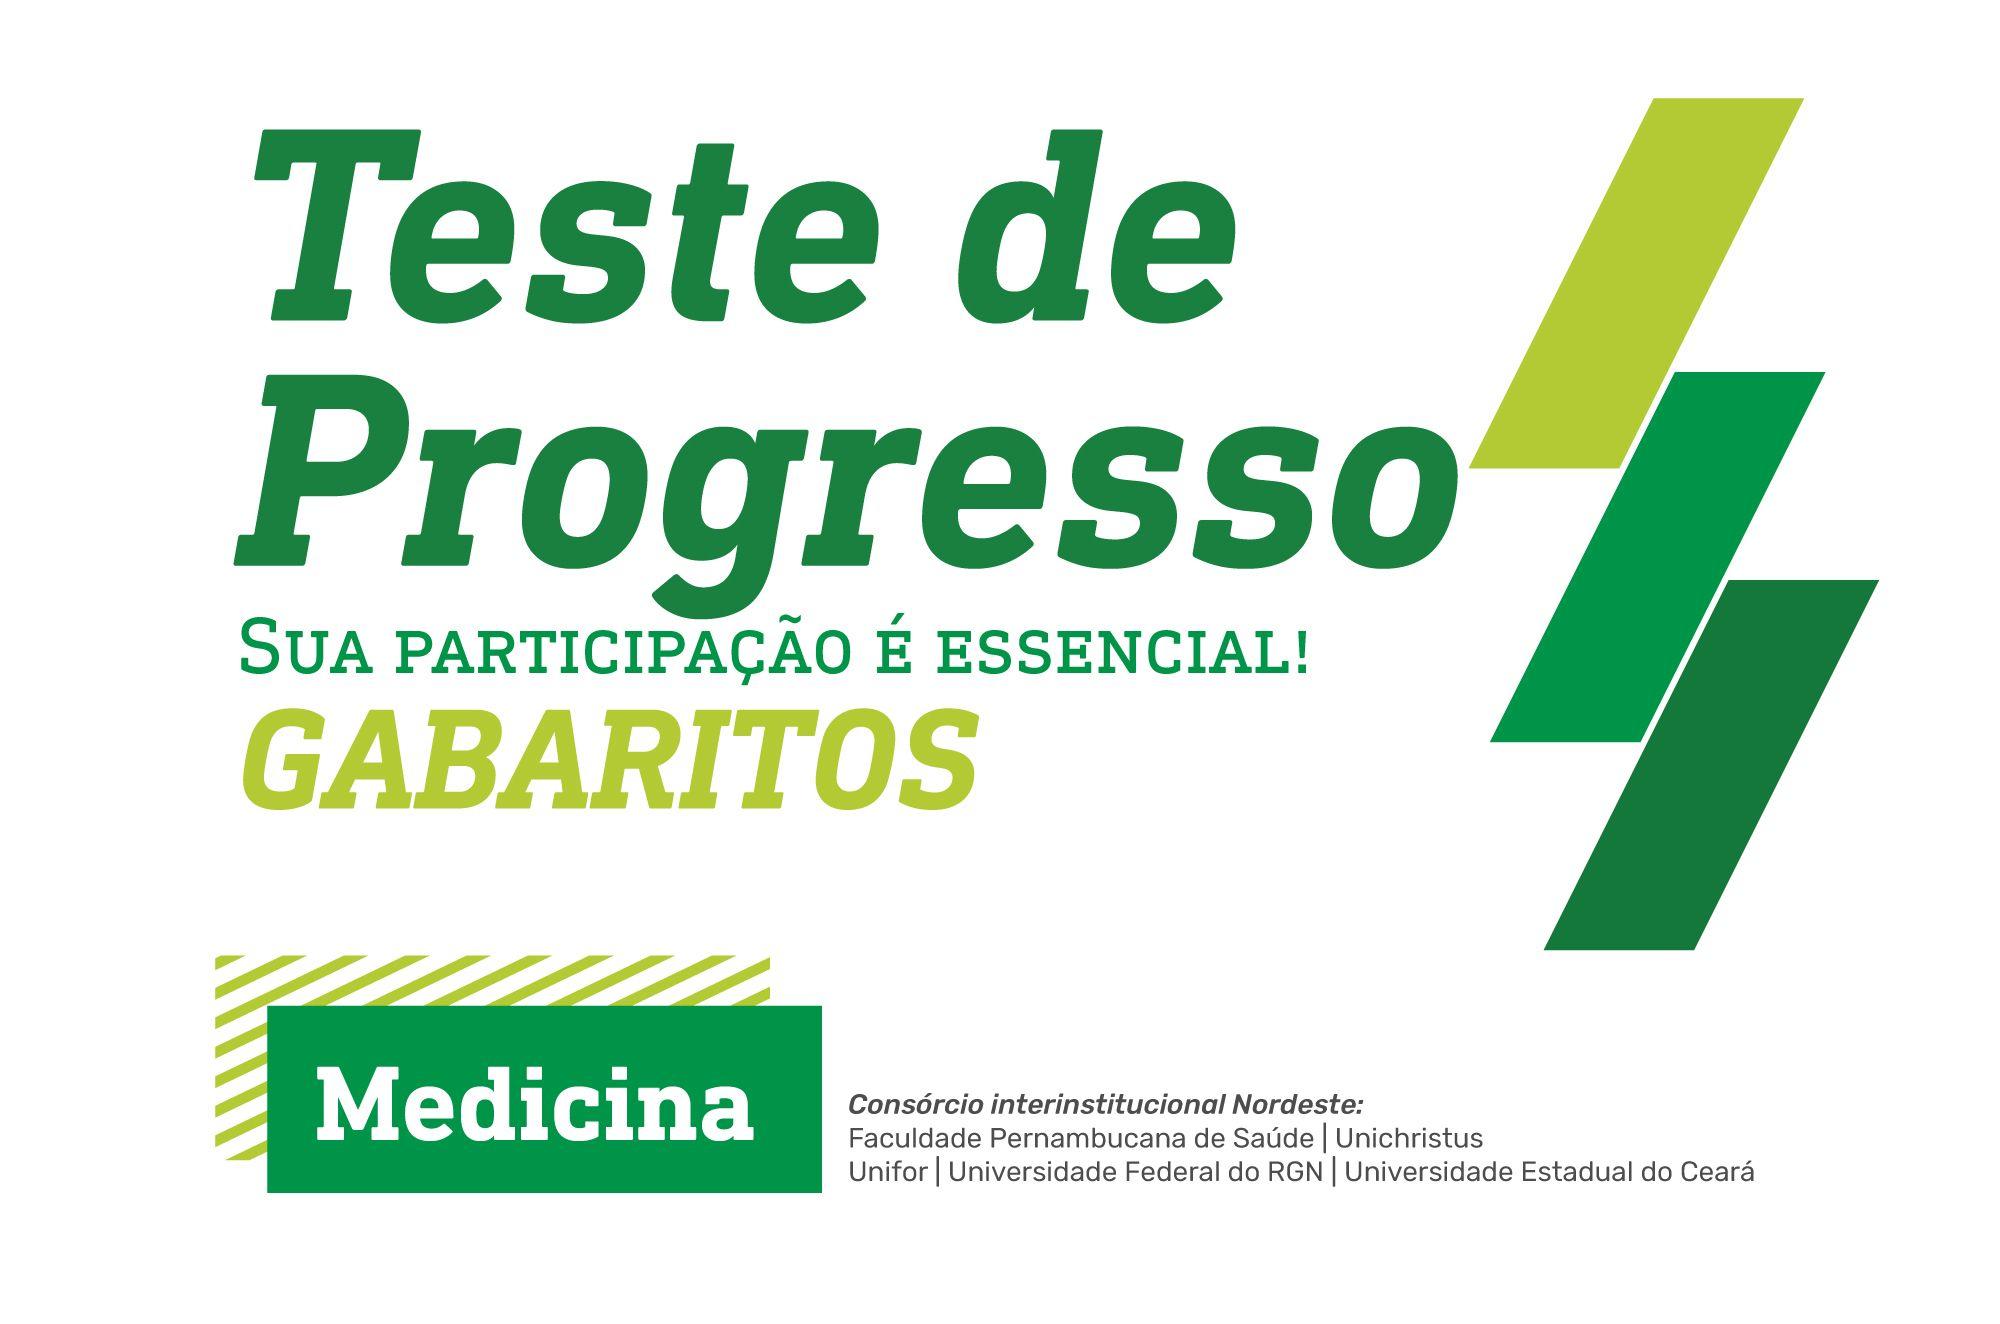 Teste de Progresso Medicina 2021.1 - Gabaritos